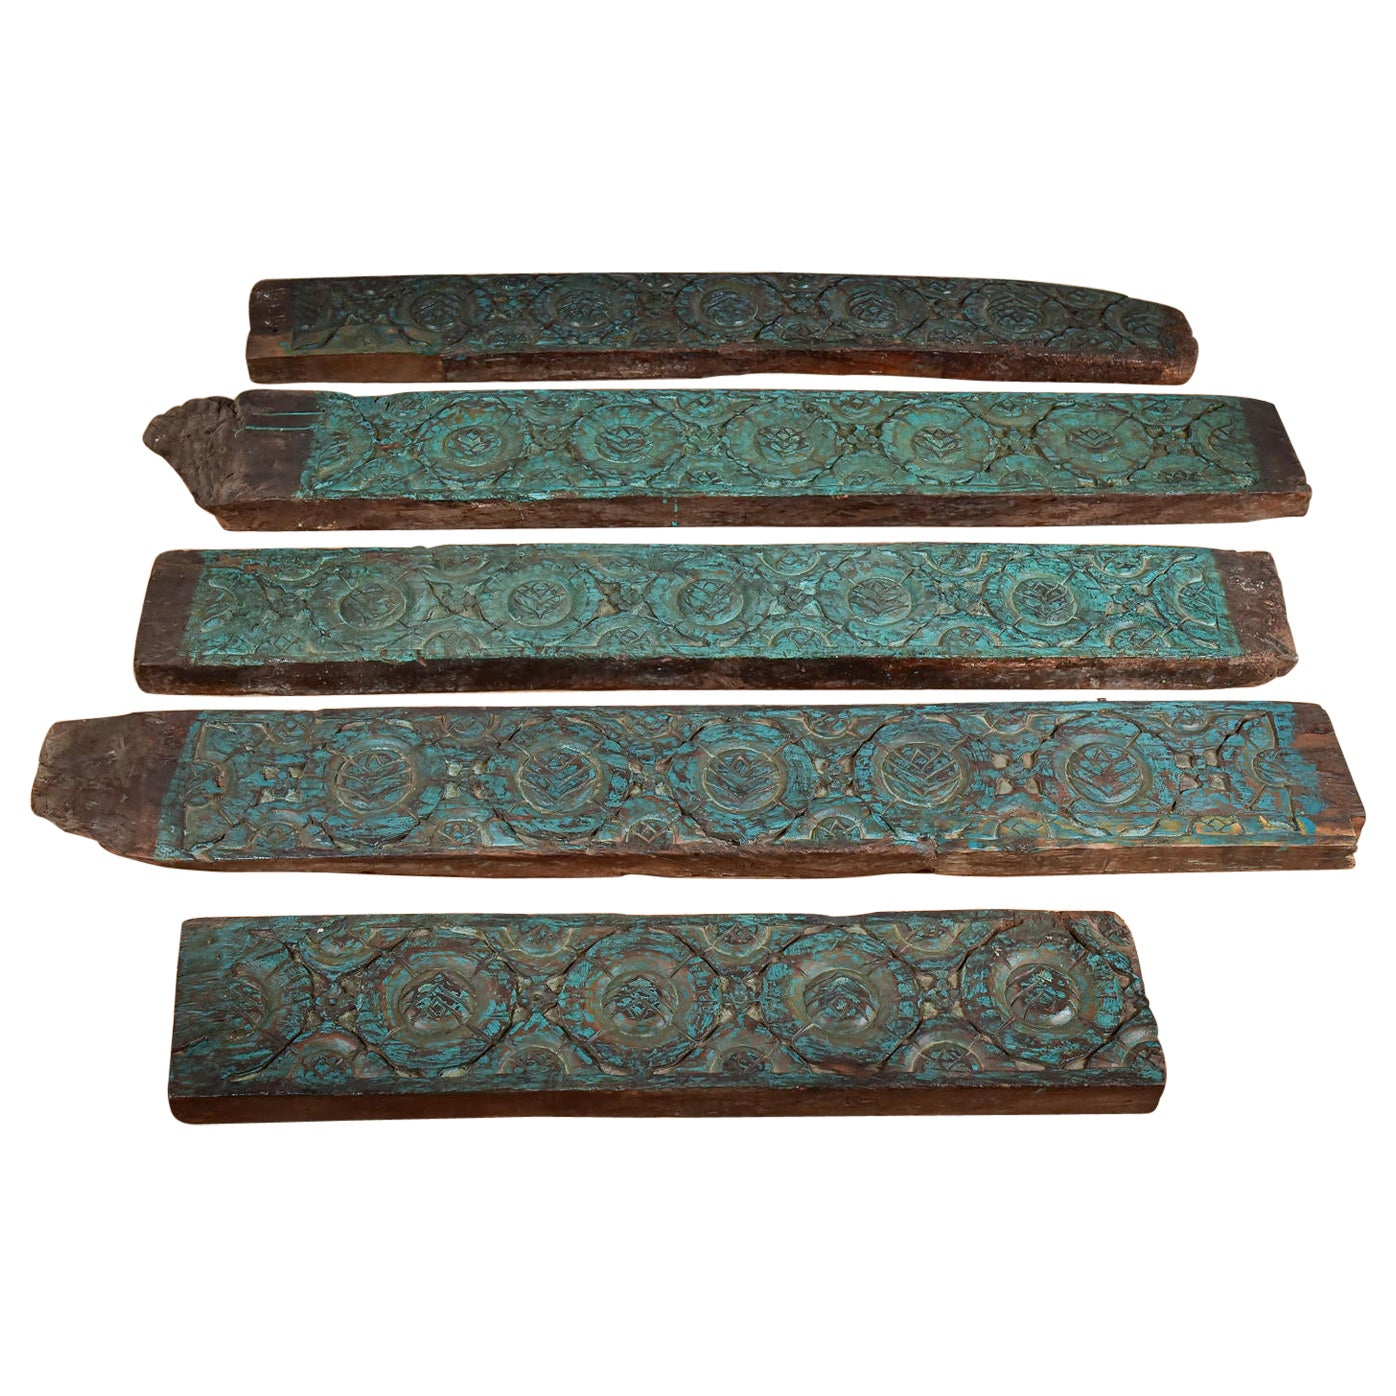 Antique Hand Carved Teak Panels, 20th Century